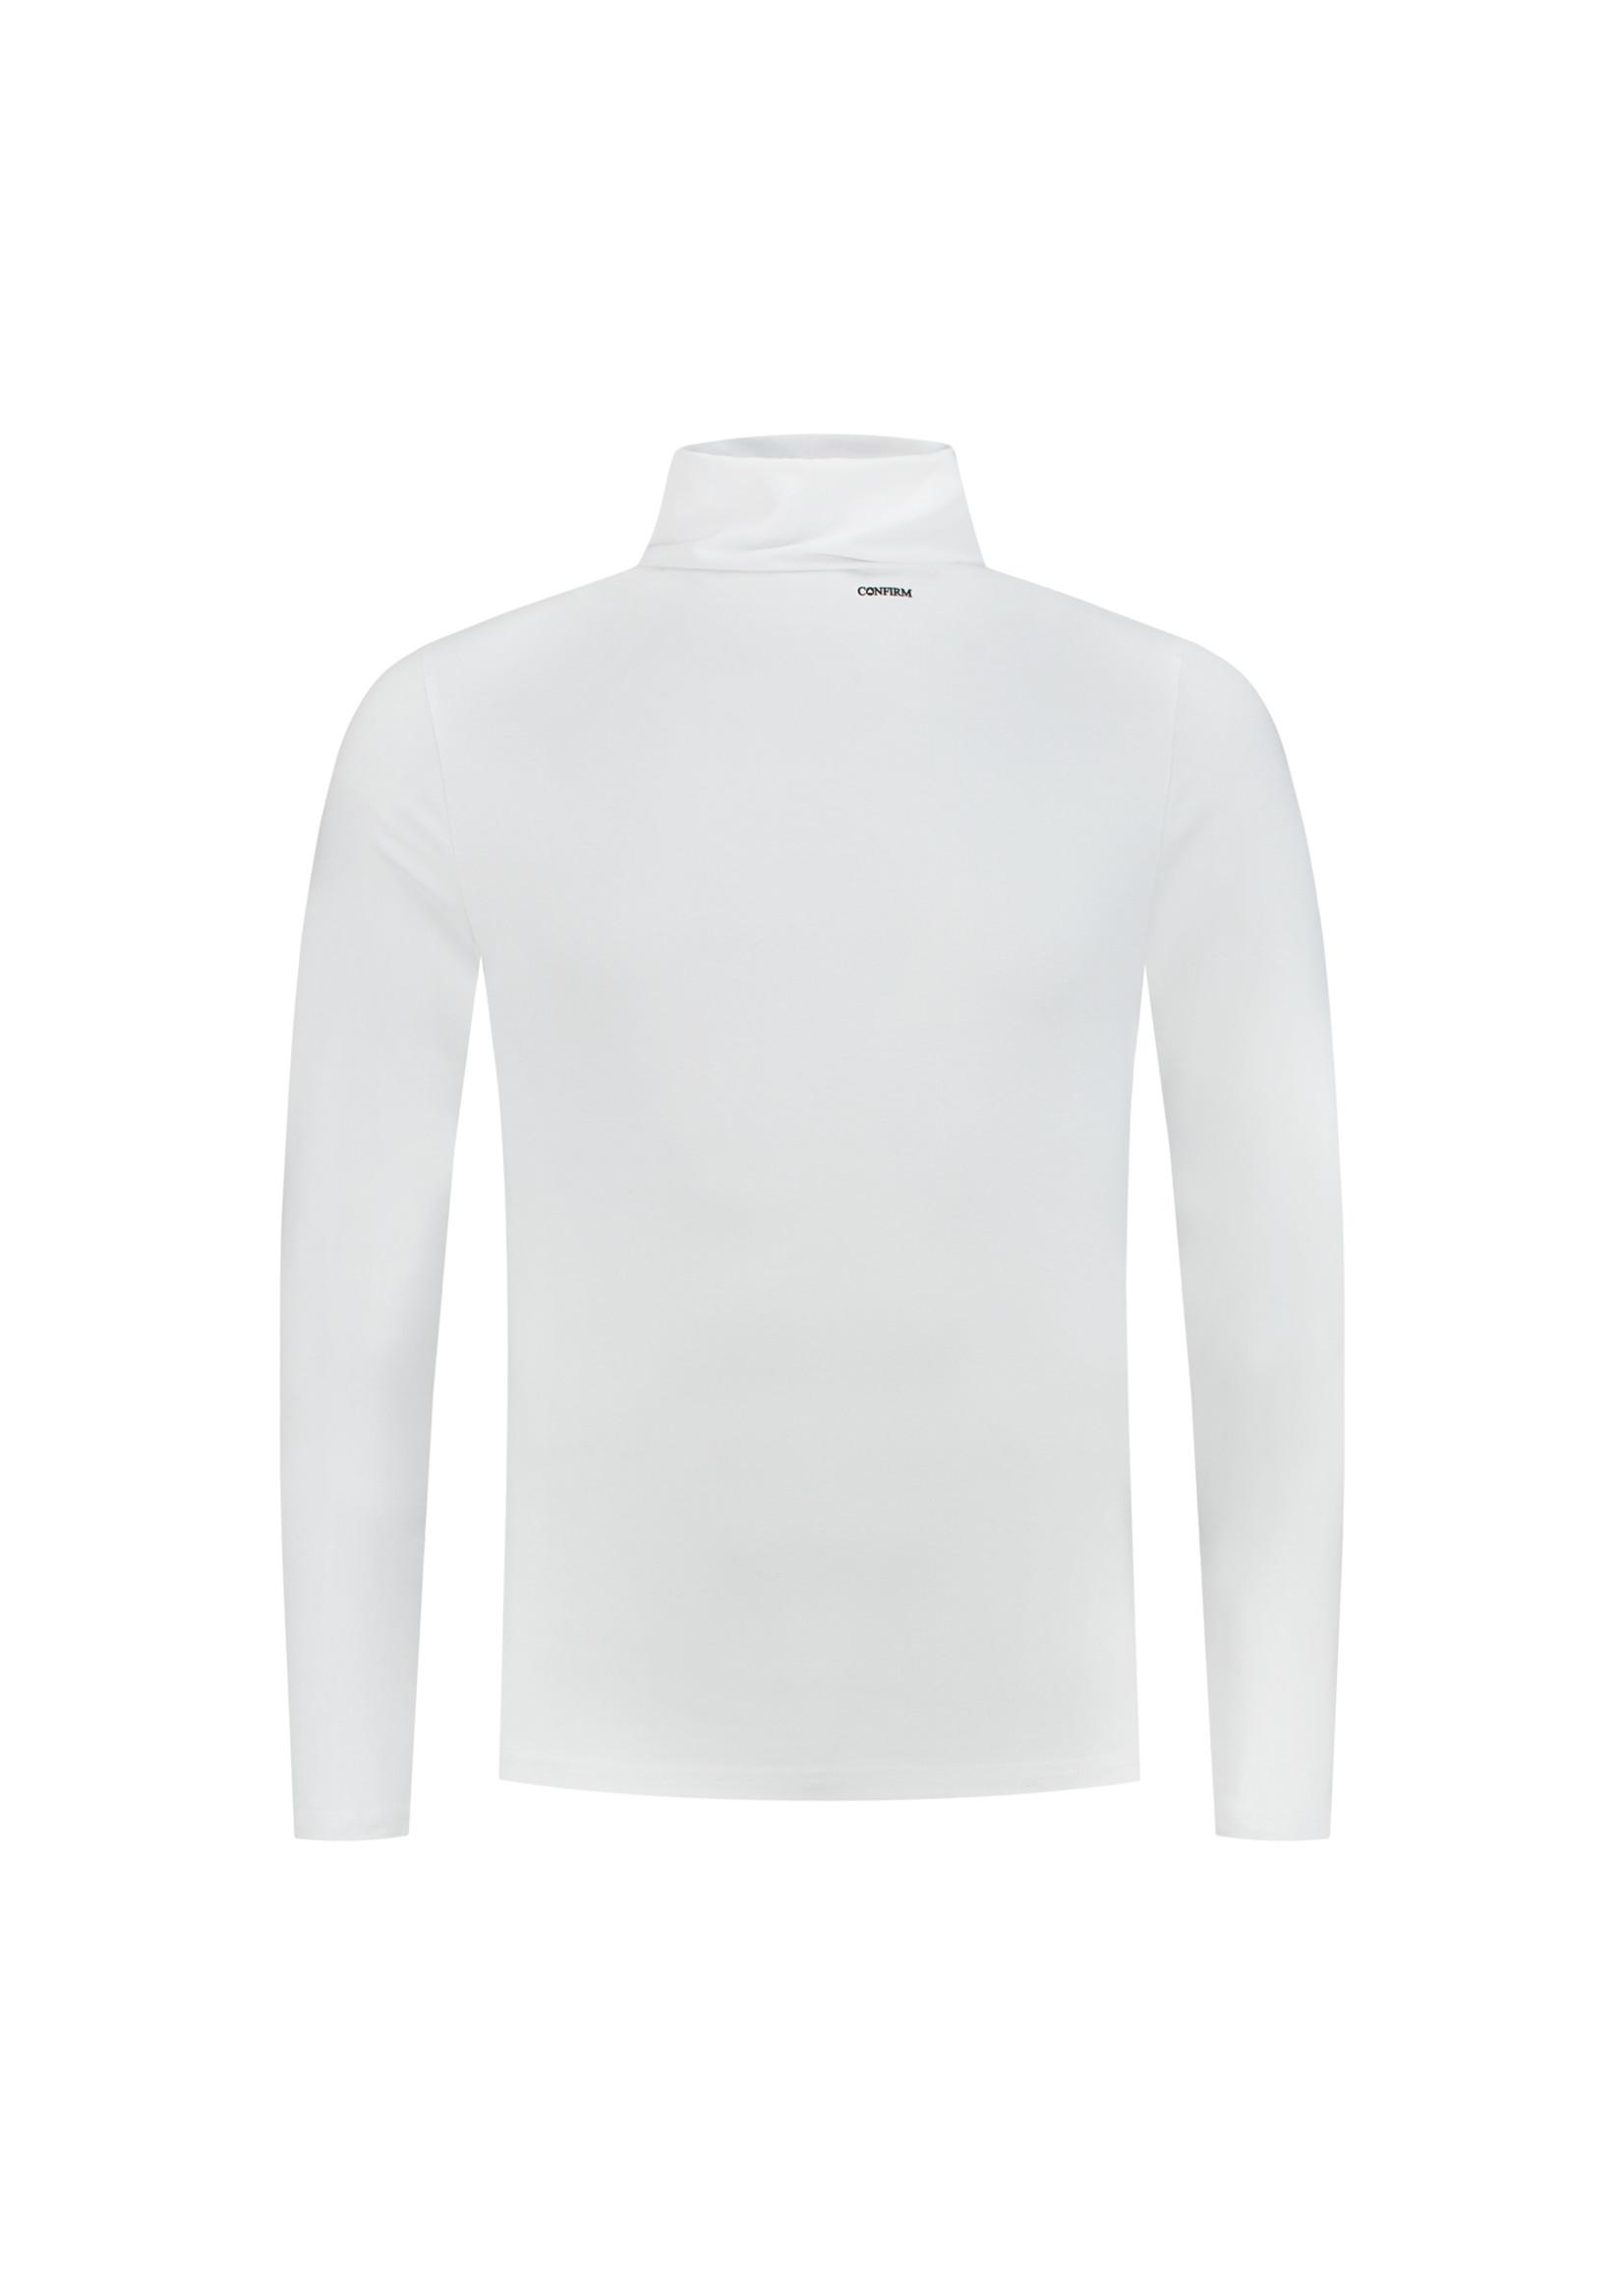 Confirm   Basic Turtleneck  - White